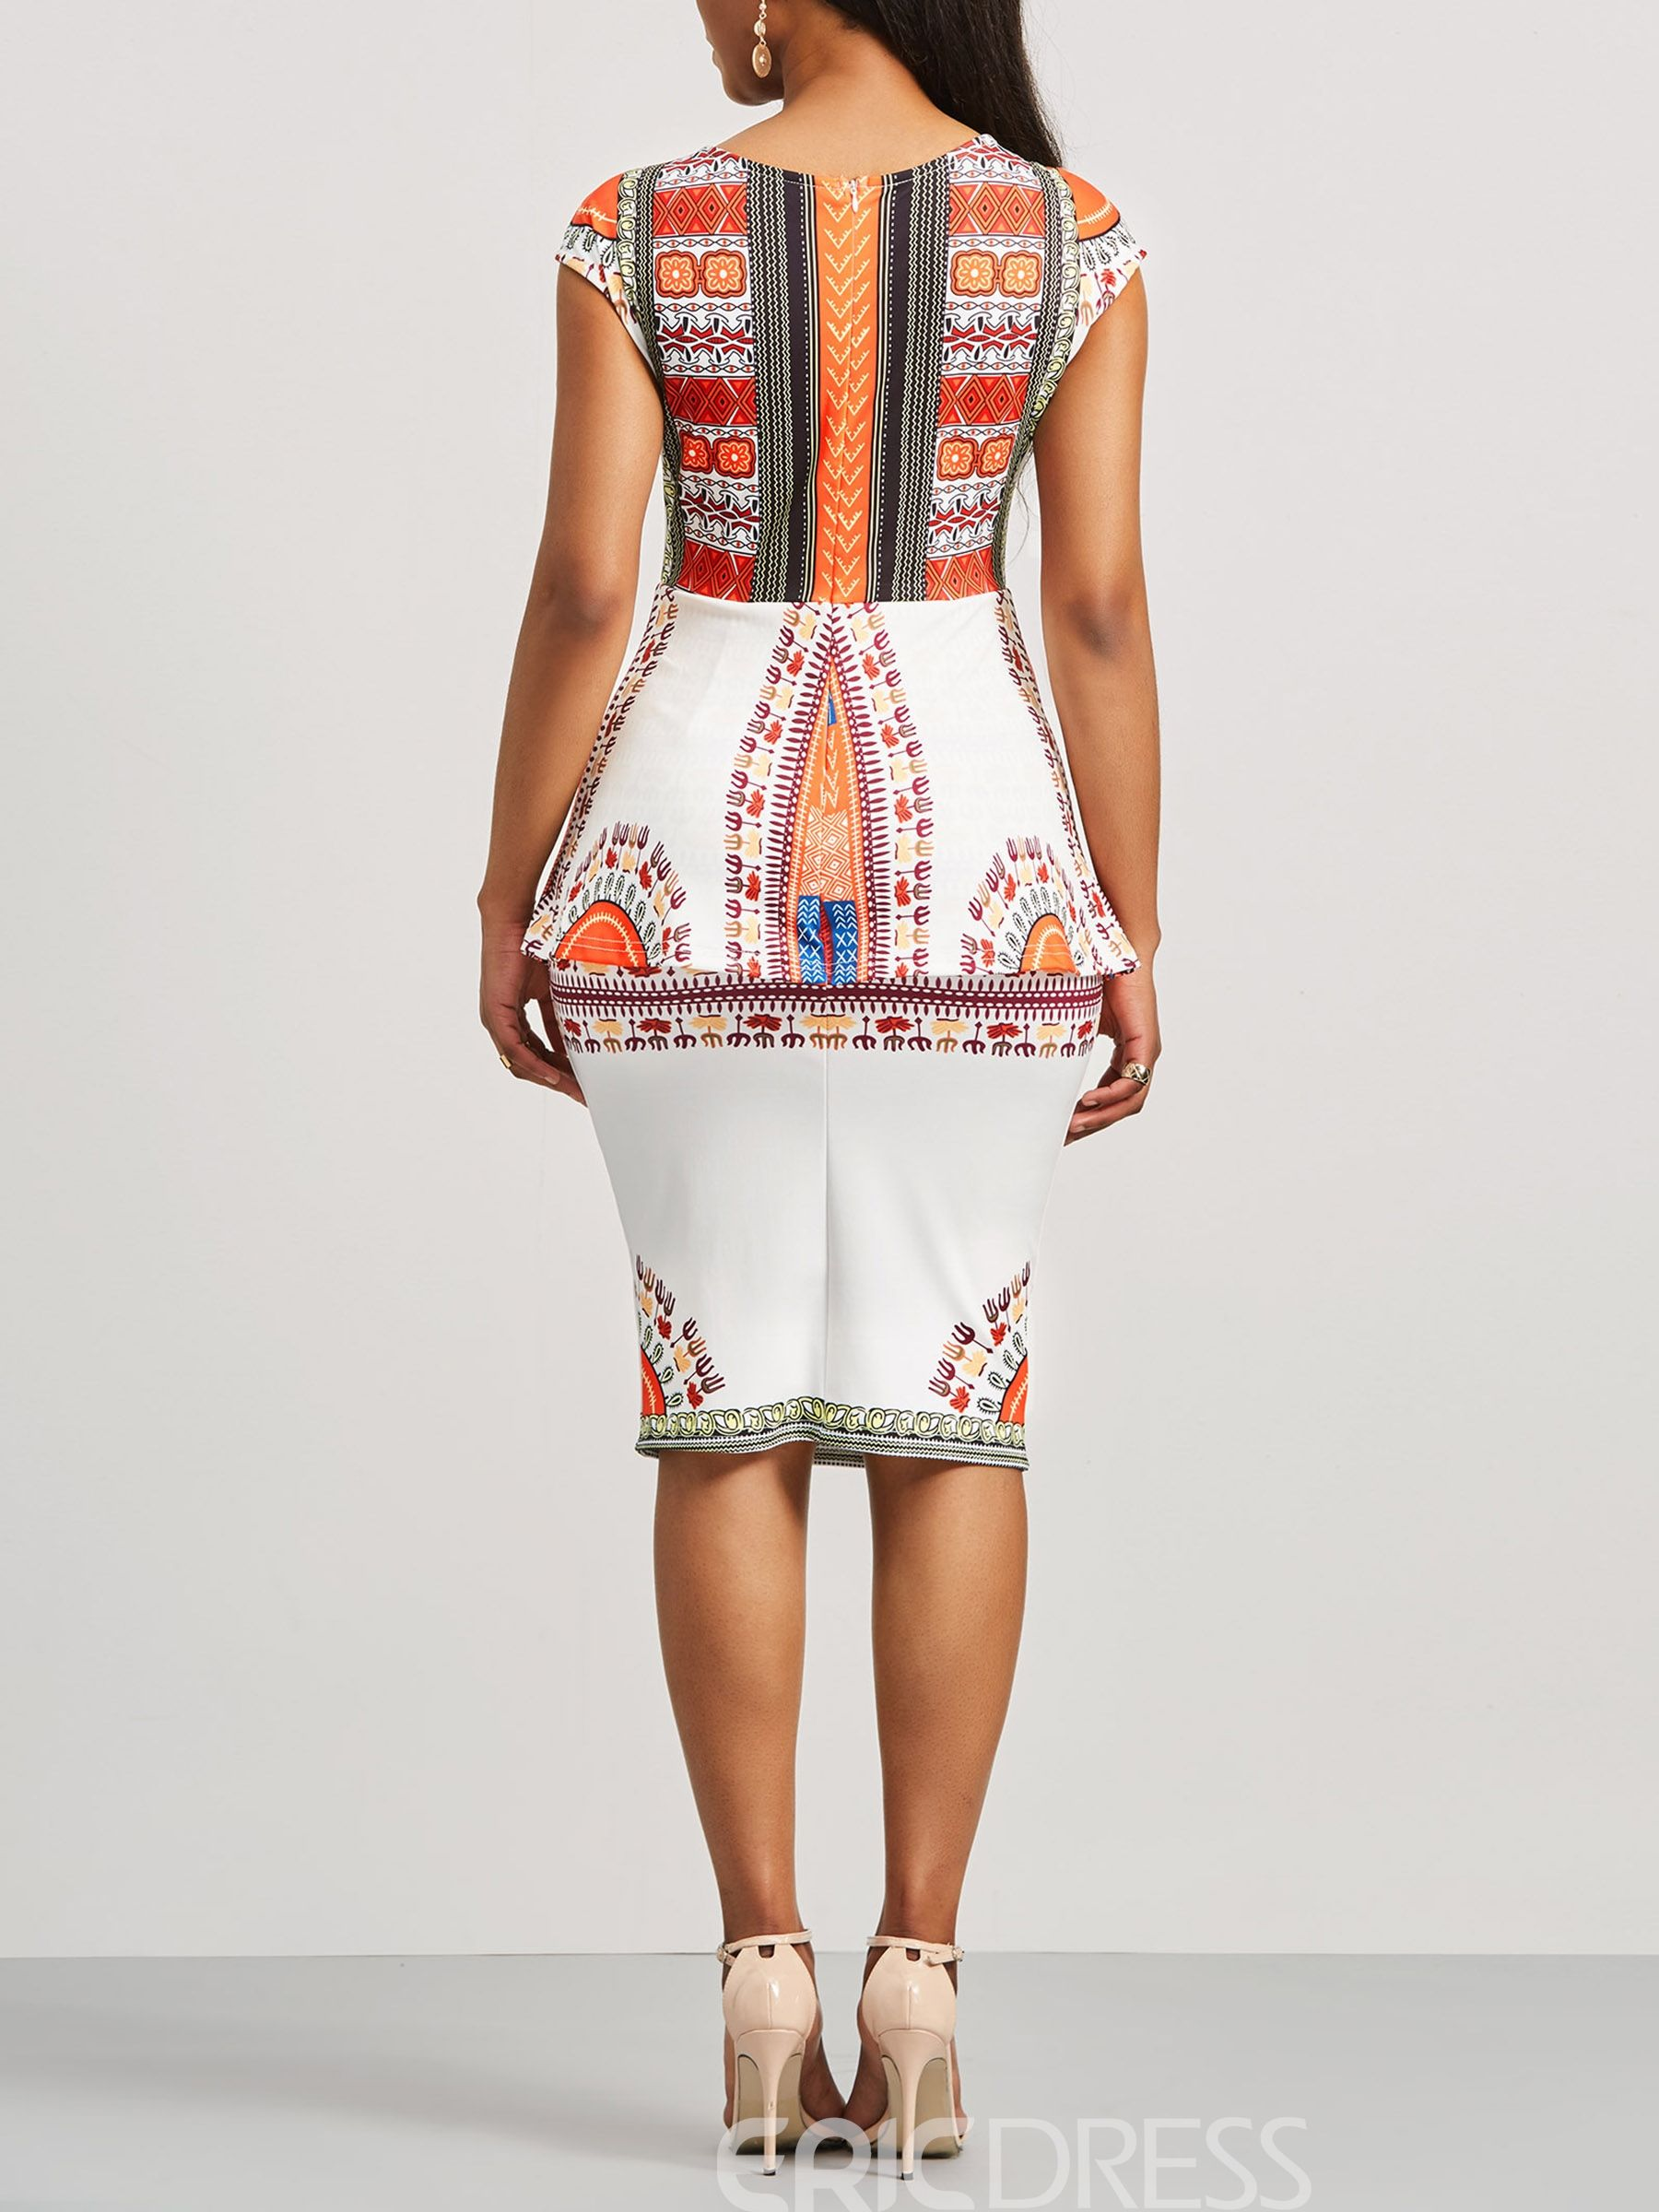 586d914de9 Ericdress Dashiki Ethnic Print Cap Sleeve Women s Bodycon Dress